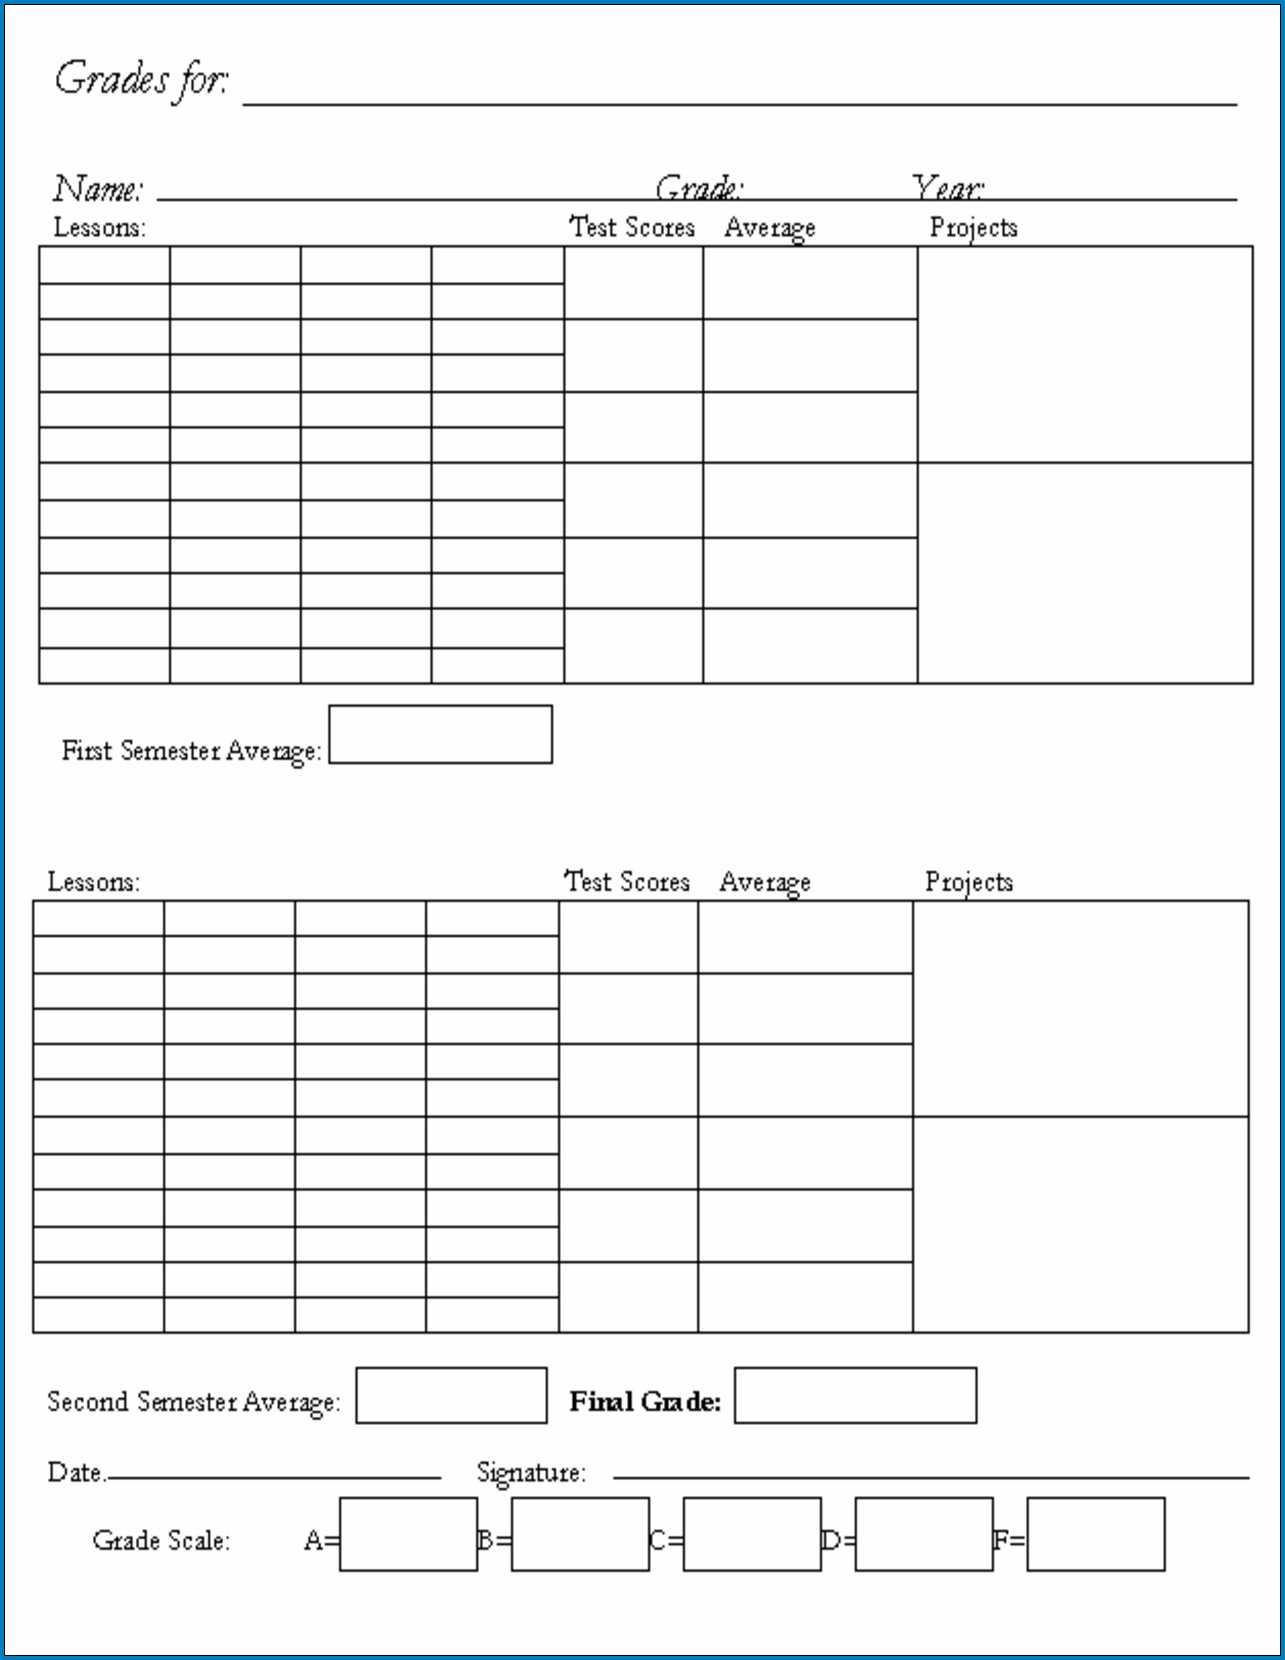 √ Free Printable Homeschool Report Card Template | Templateral Within Homeschool Middle School Report Card Template